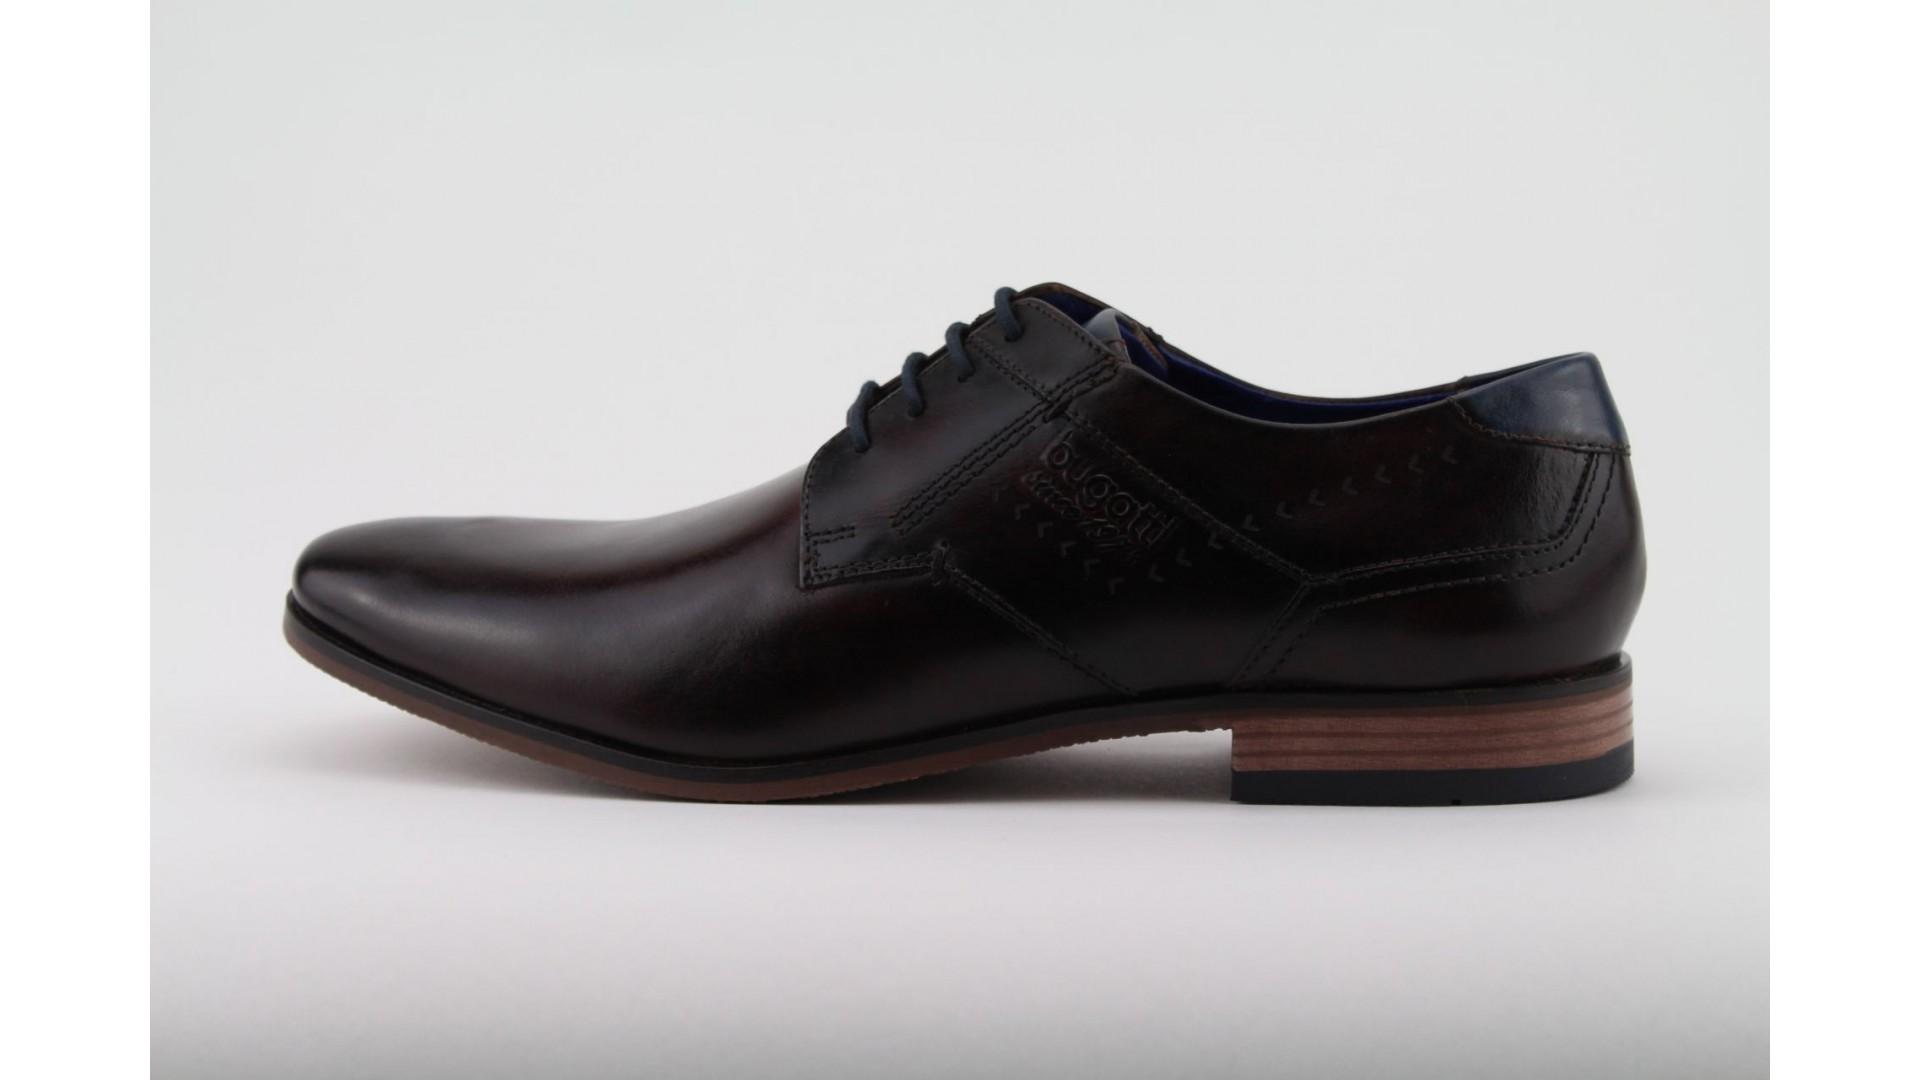 BUGATTI bordó bőr férfi cipő dde82a4d6e